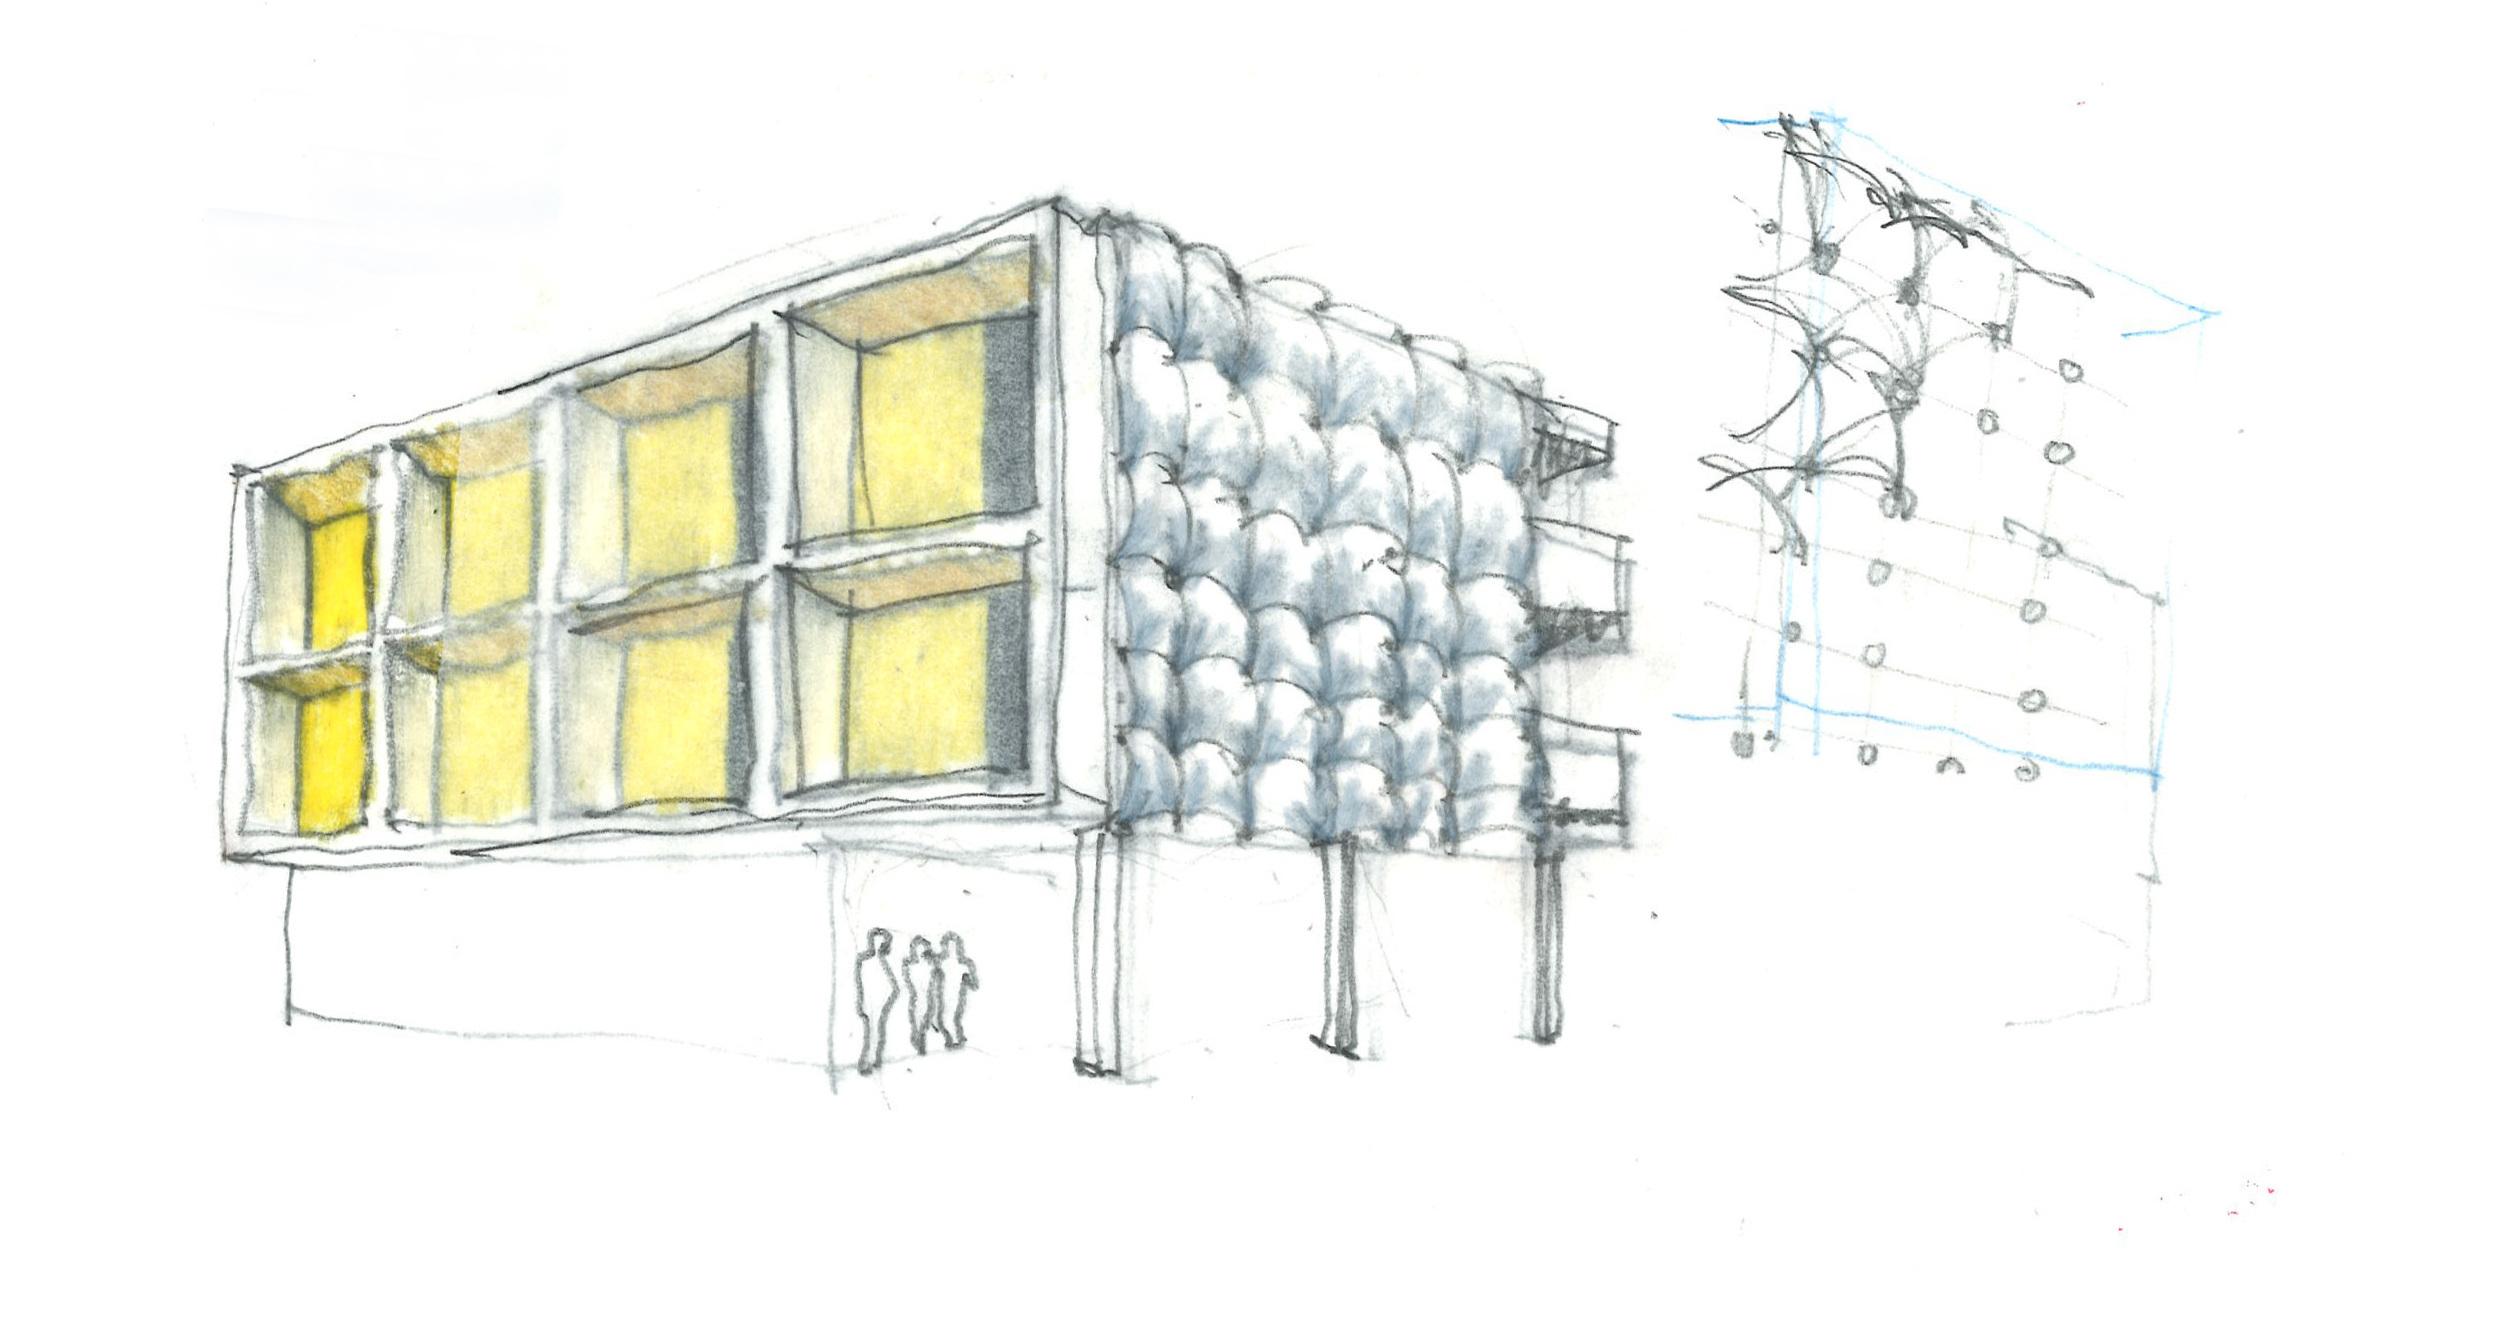 Sparano Mooney Architecture_Central 9_Process_Sketch_Facade_High Density.jpg